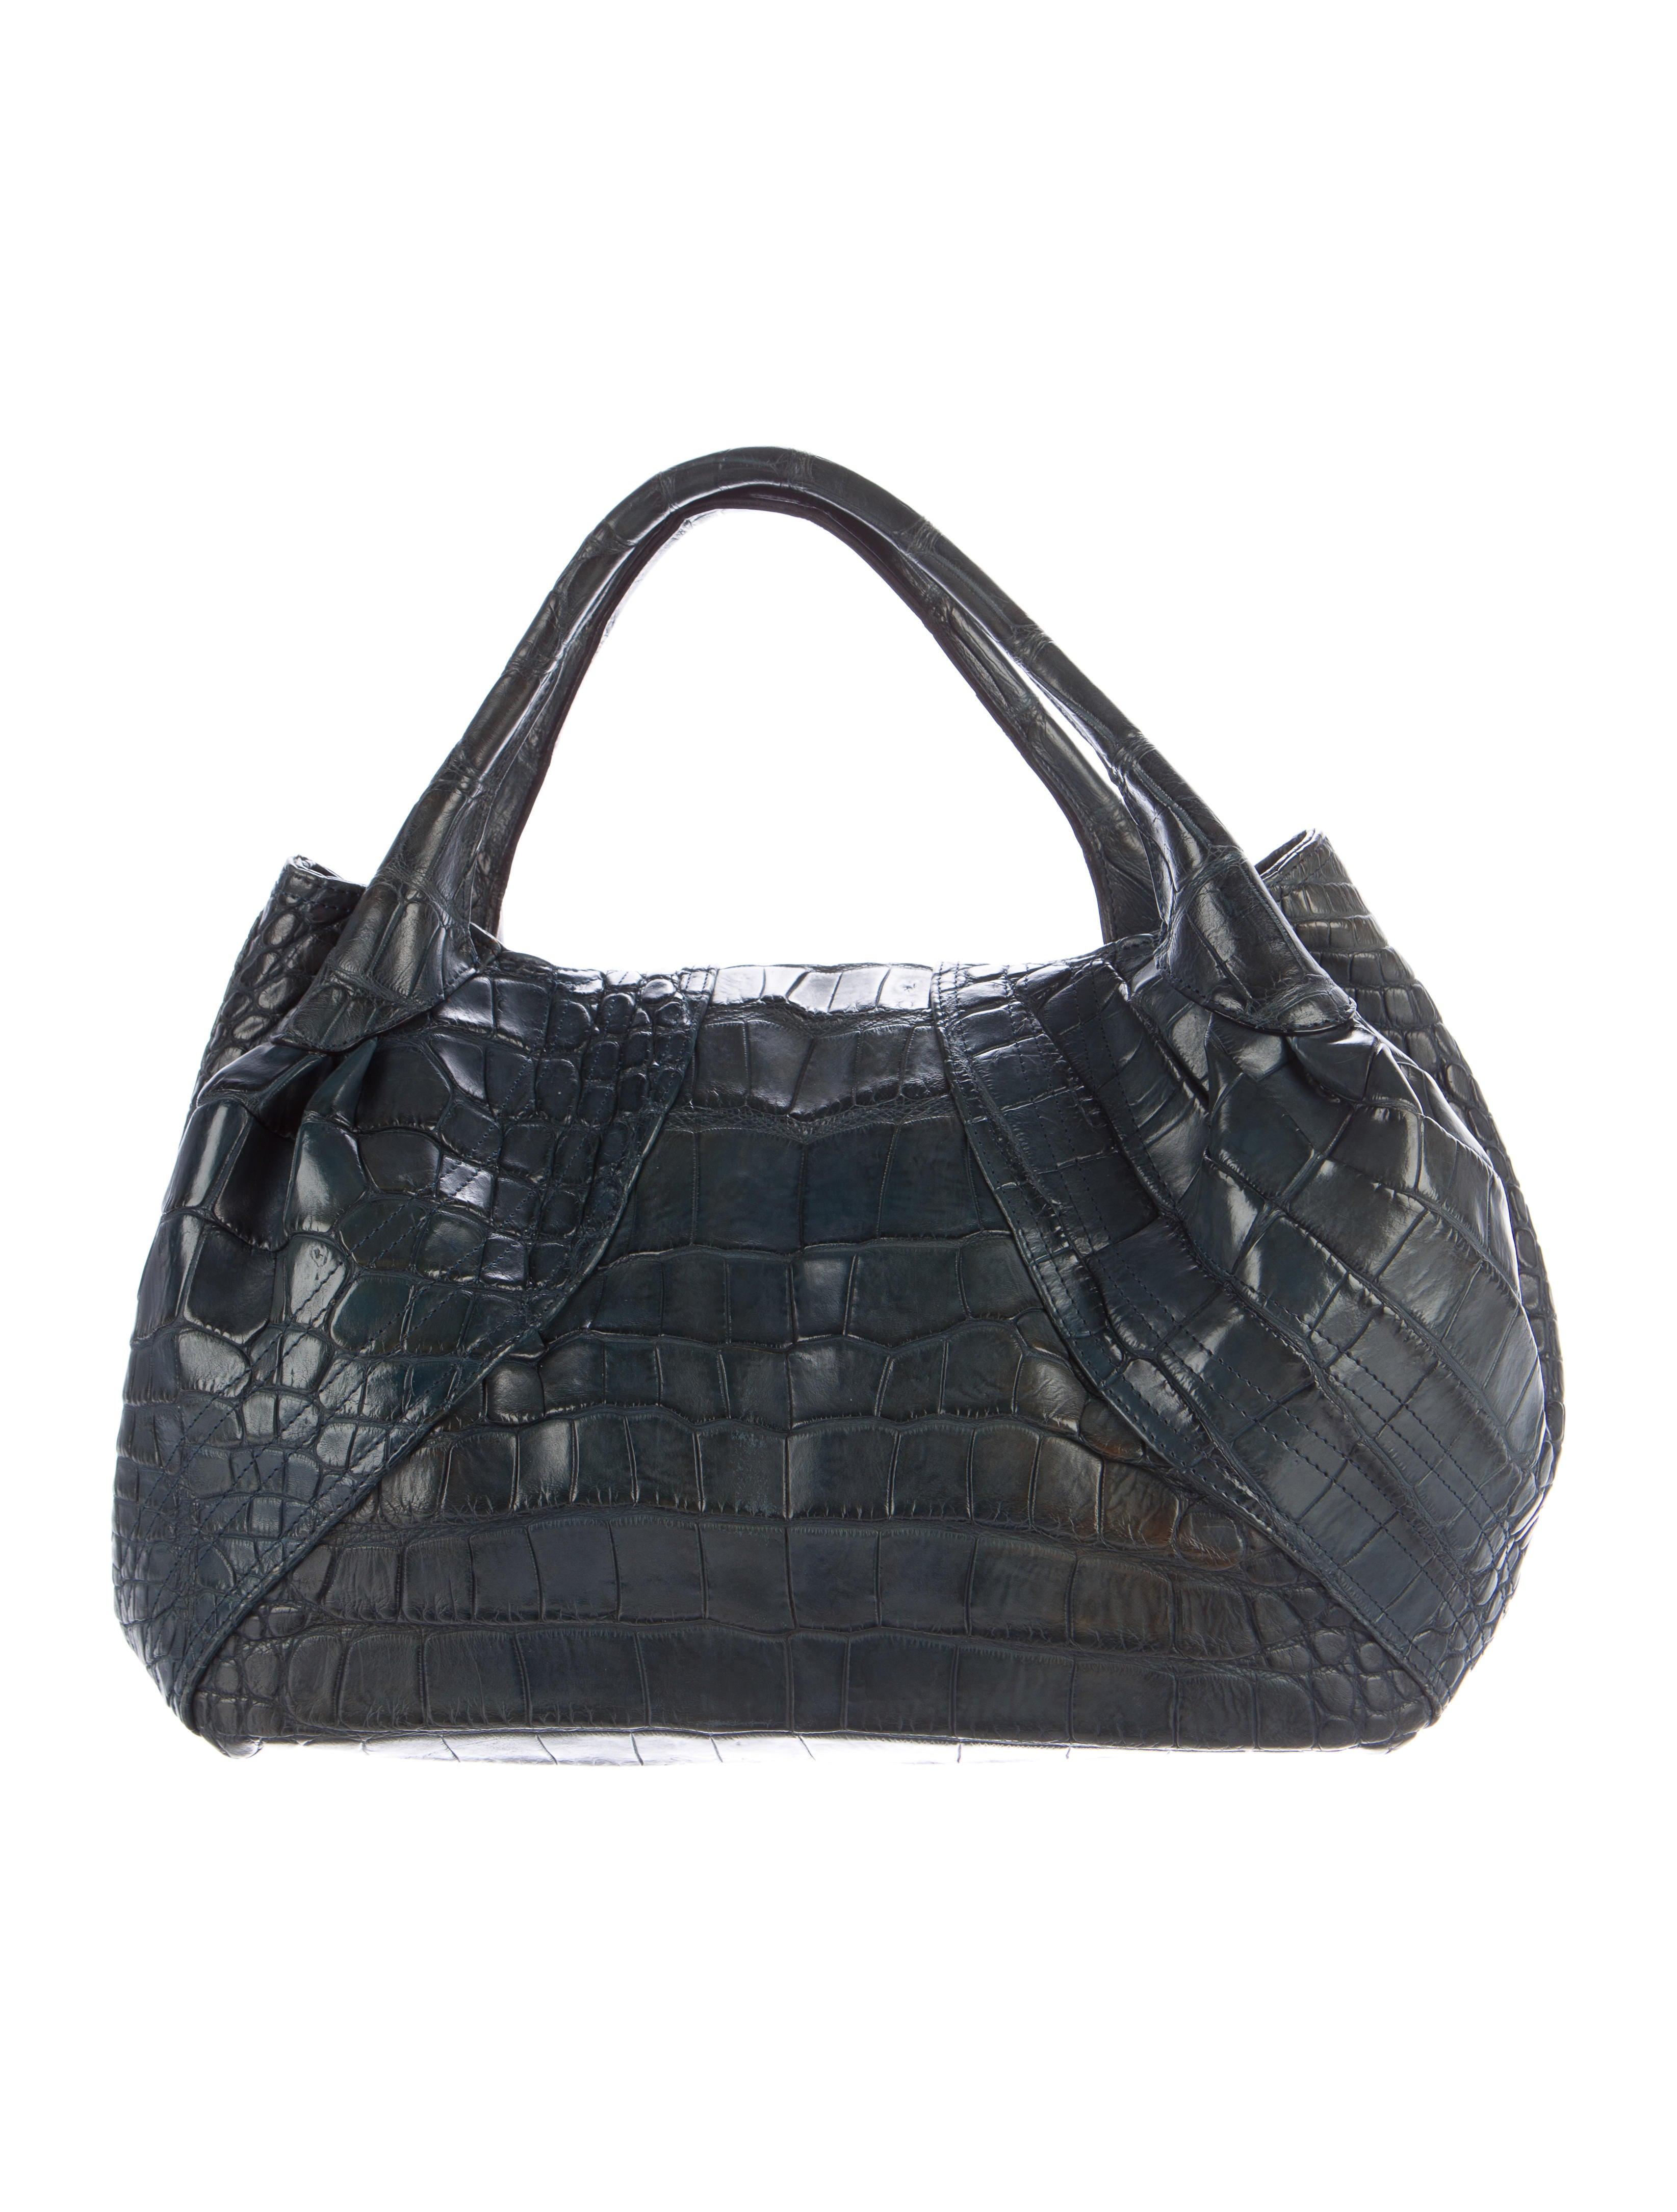 Fendi Alligator Handbag